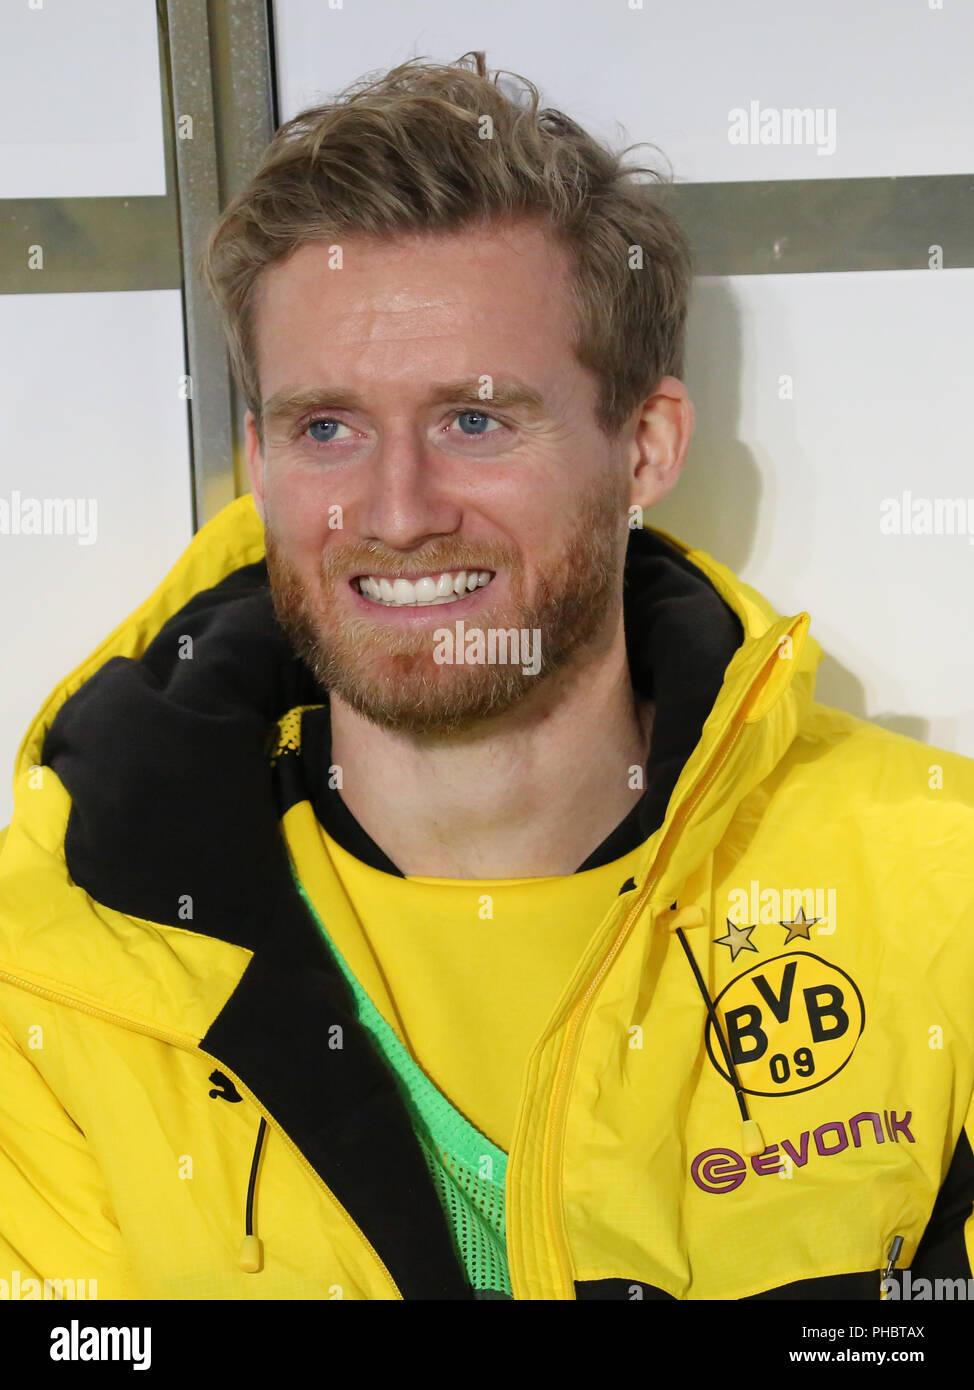 Andre Schürrle ( Borussia Dortmund) - Stock Image